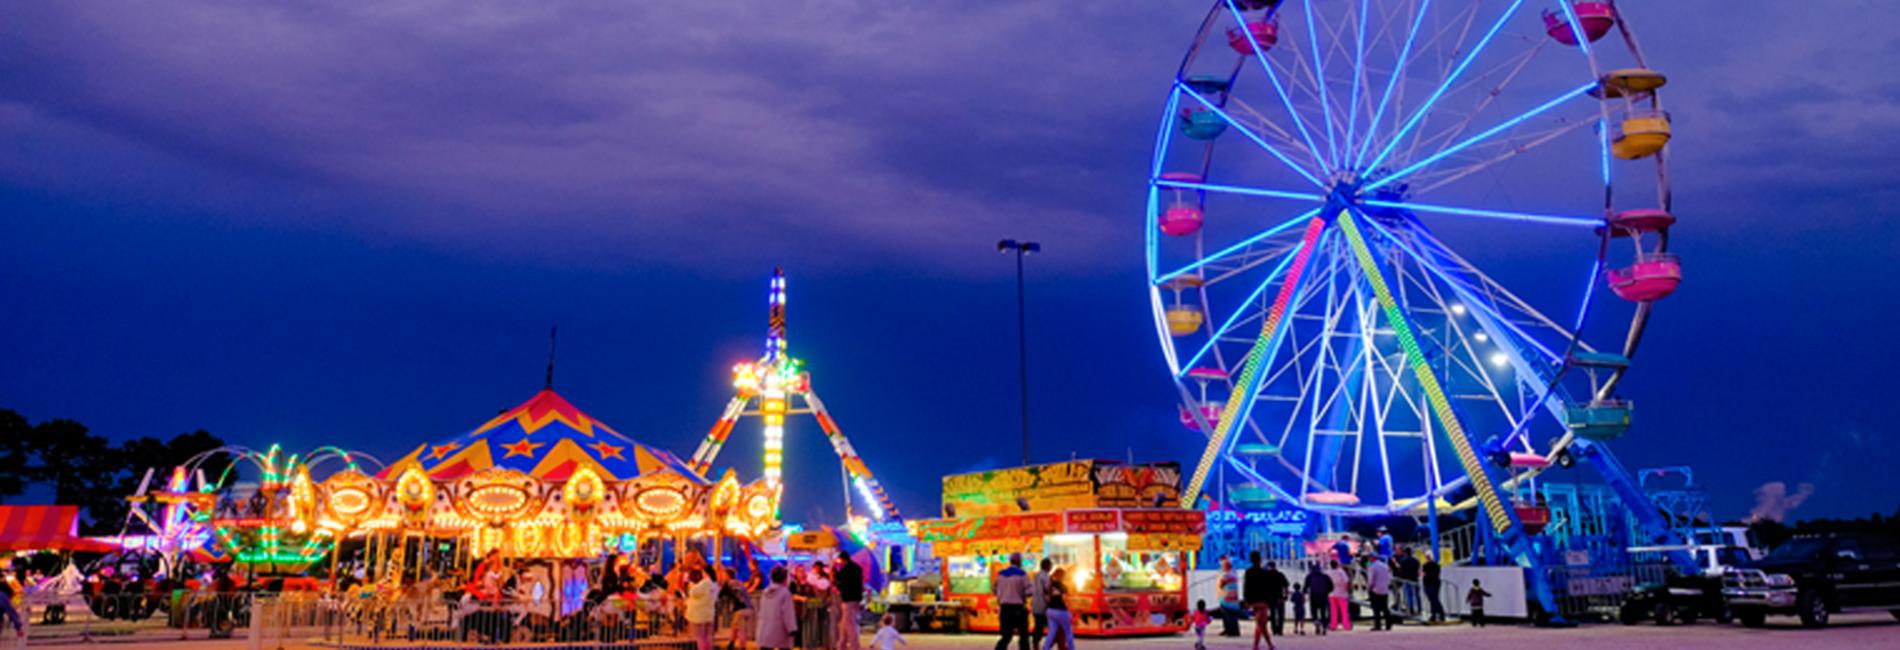 Lake Charles Event Calendar | 2019 Calendar of Events